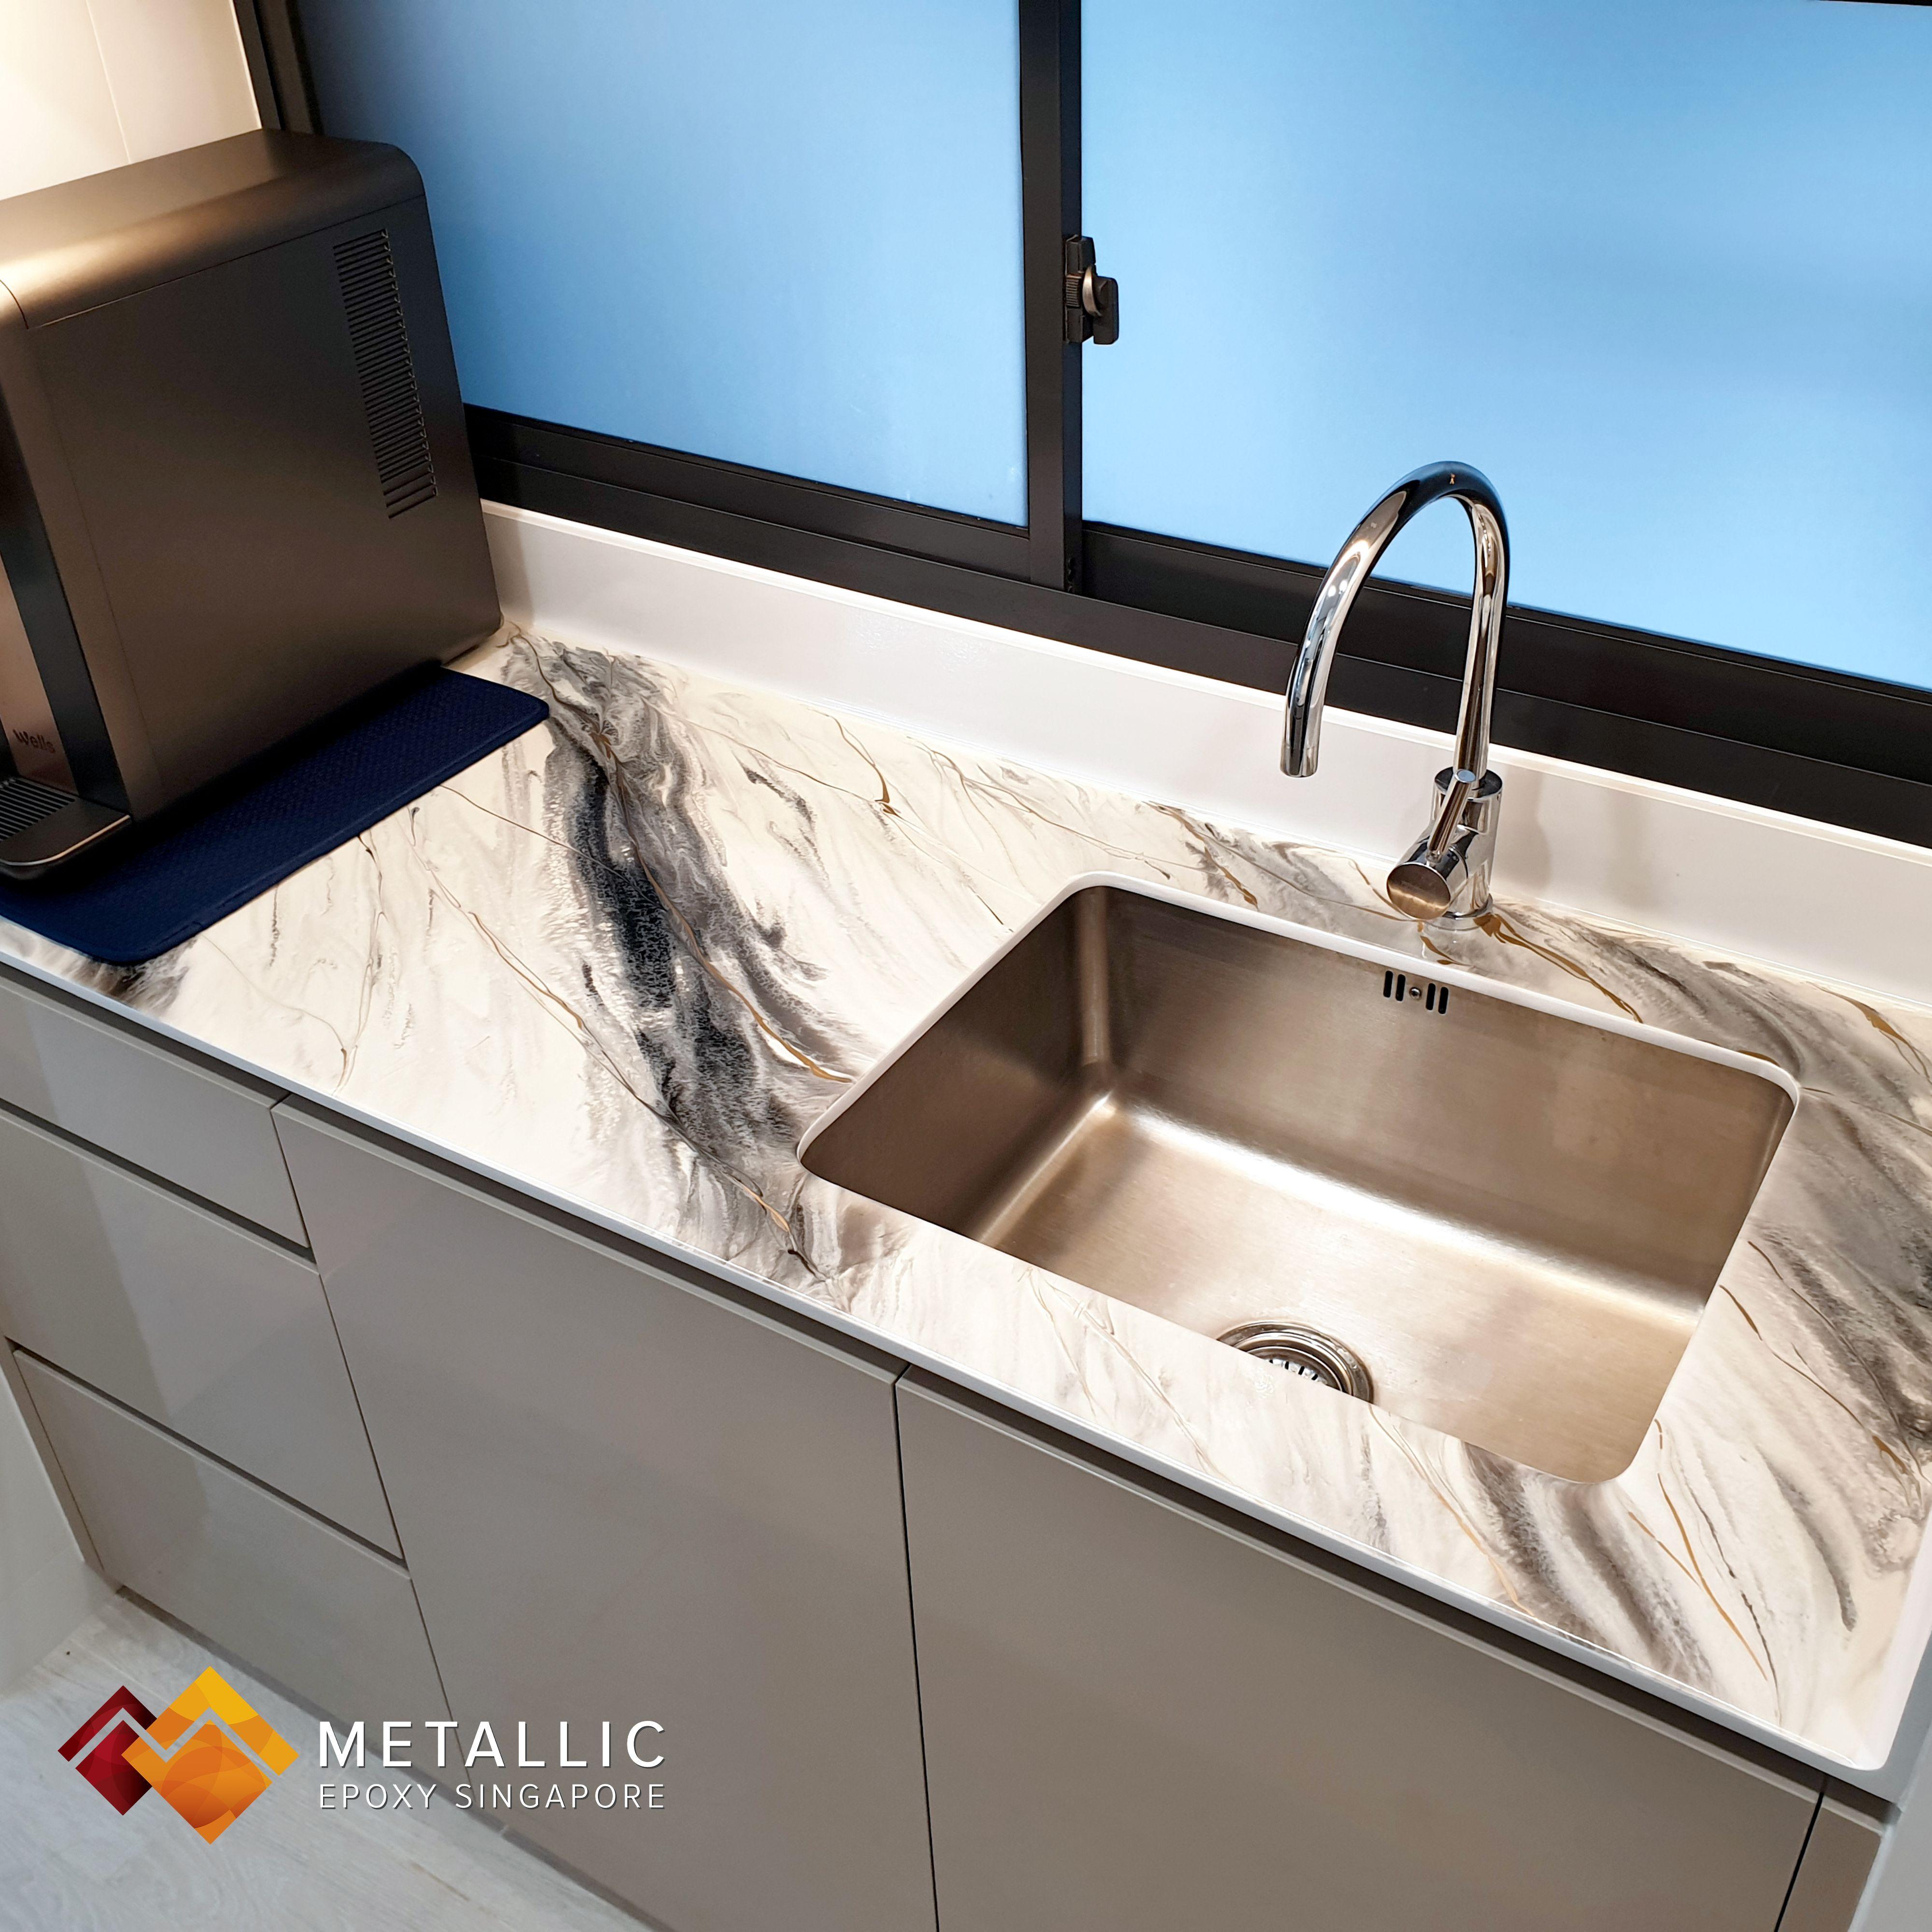 Metallic Epoxy Singapore Silver Black Highlights Gold Veins Marble Countertop Countertops Countertop Design Kitchen Countertops